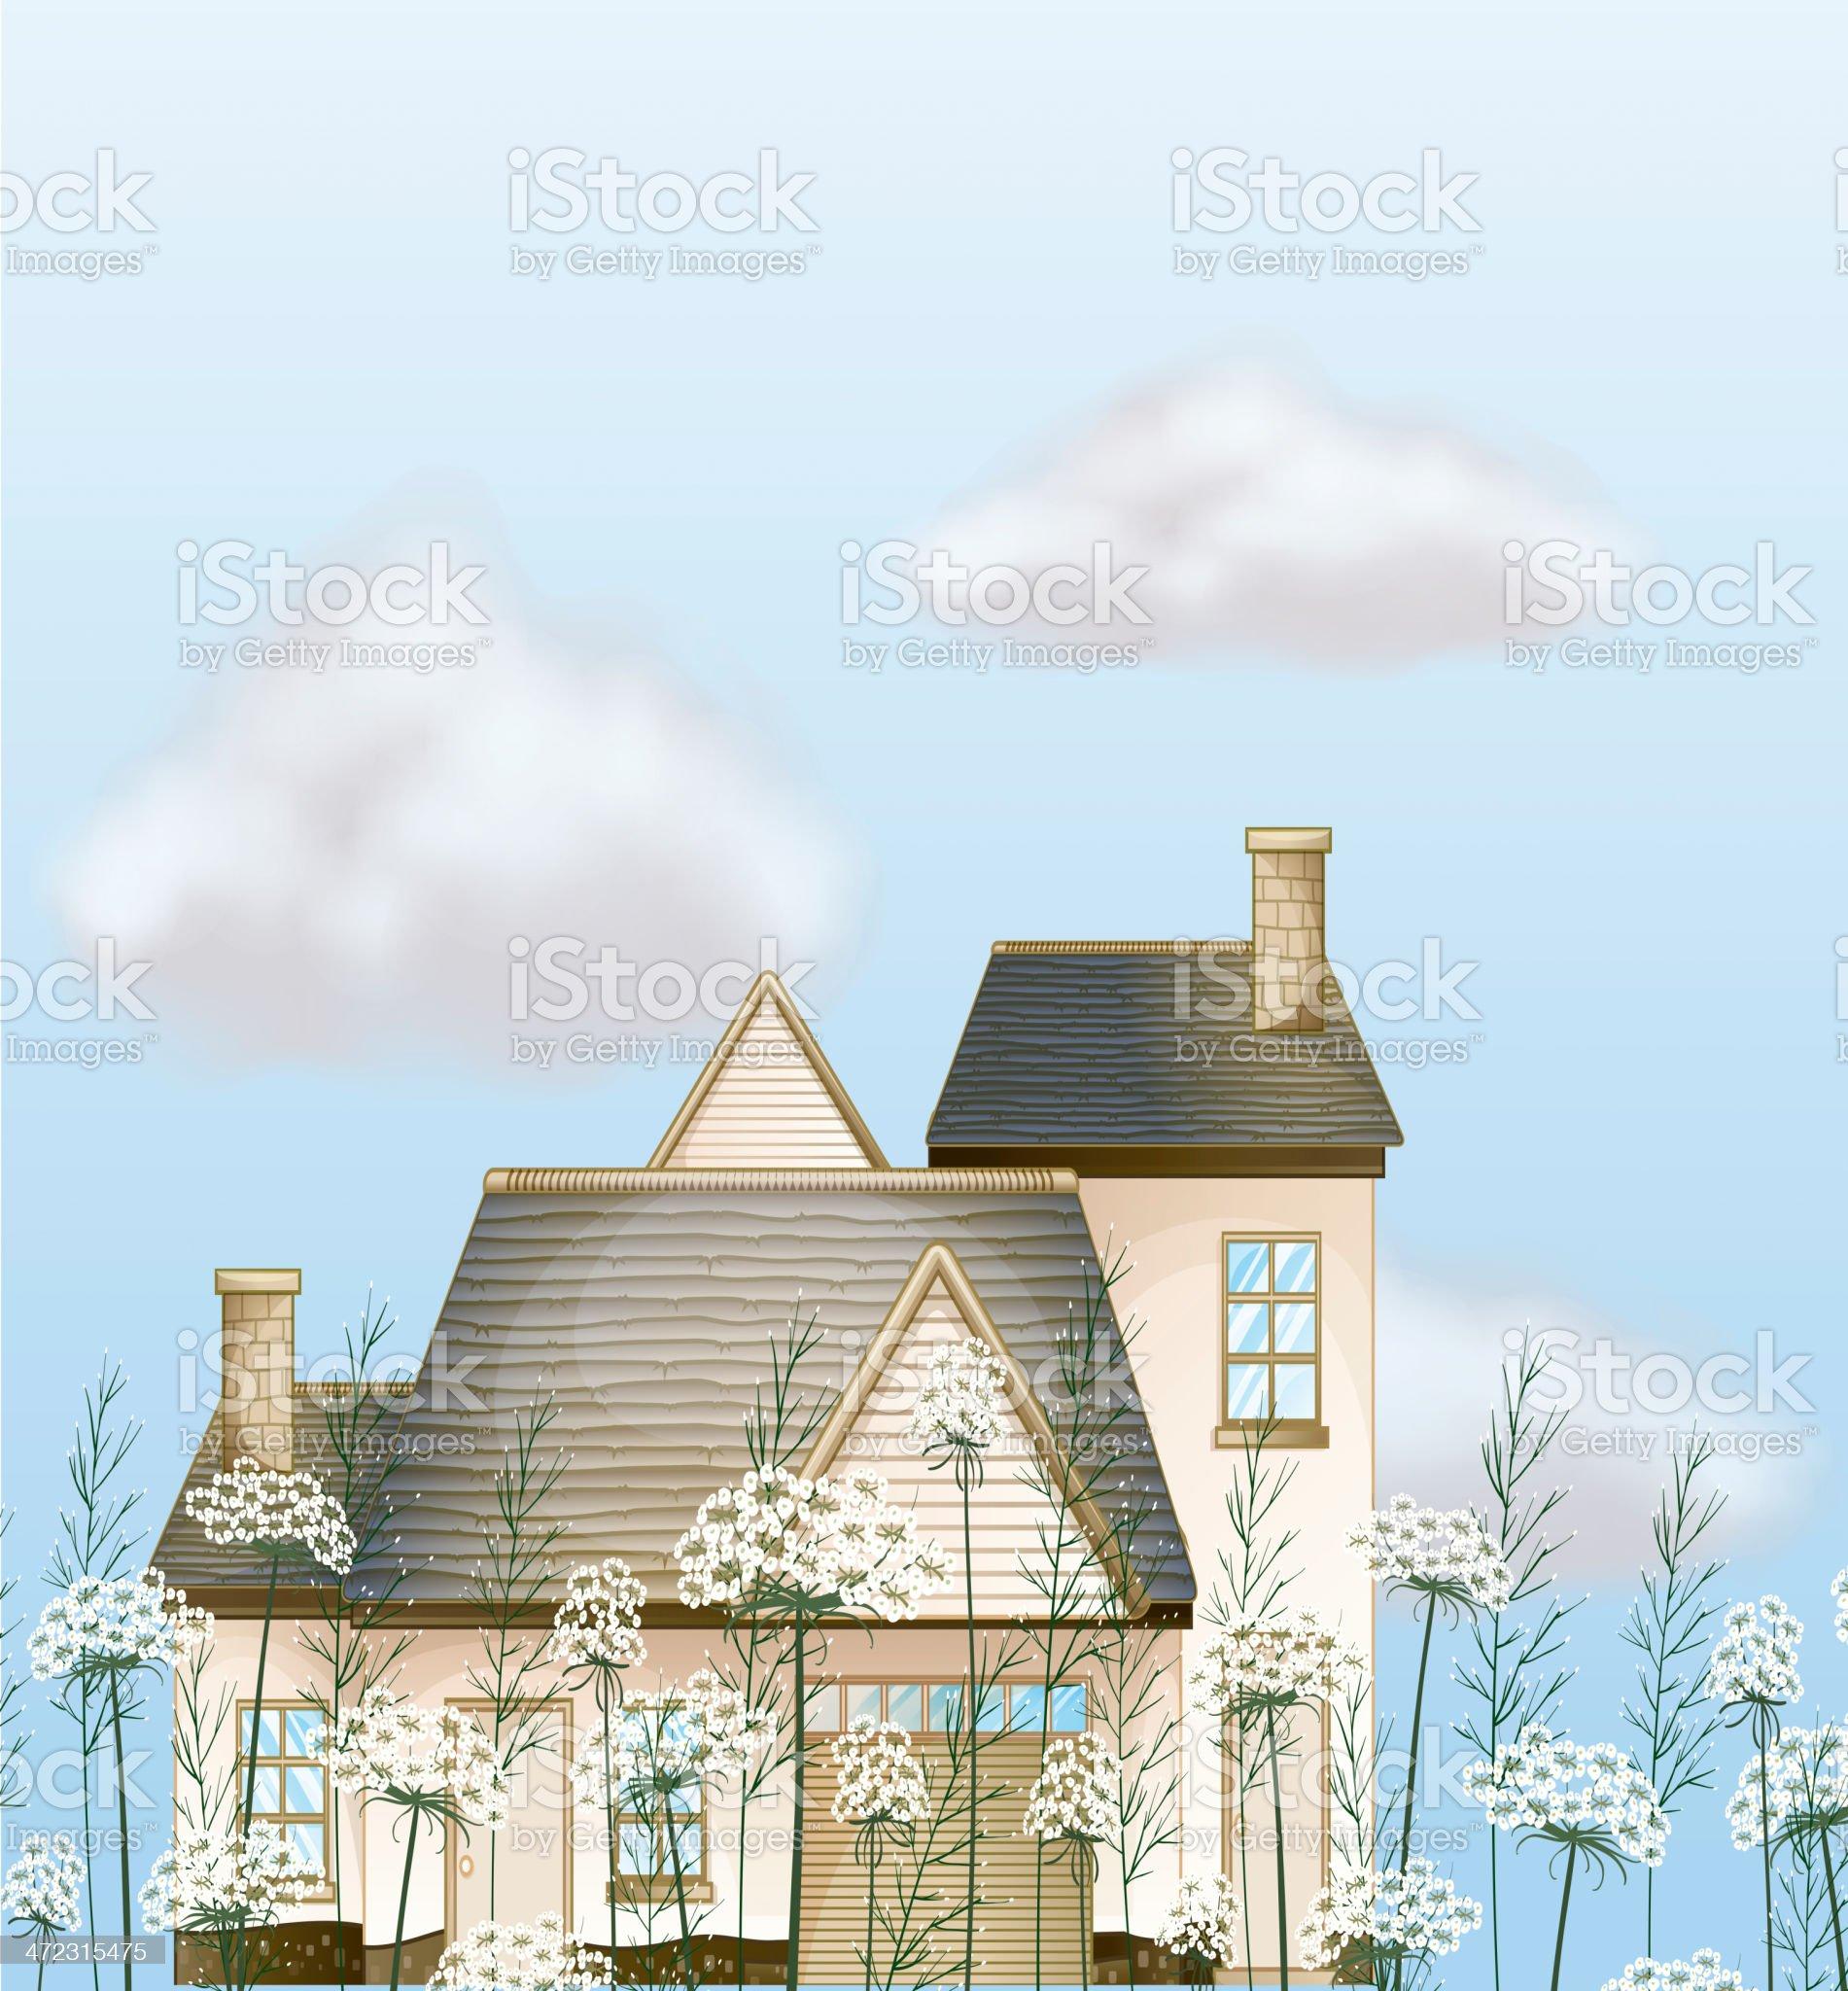 Big house royalty-free stock vector art